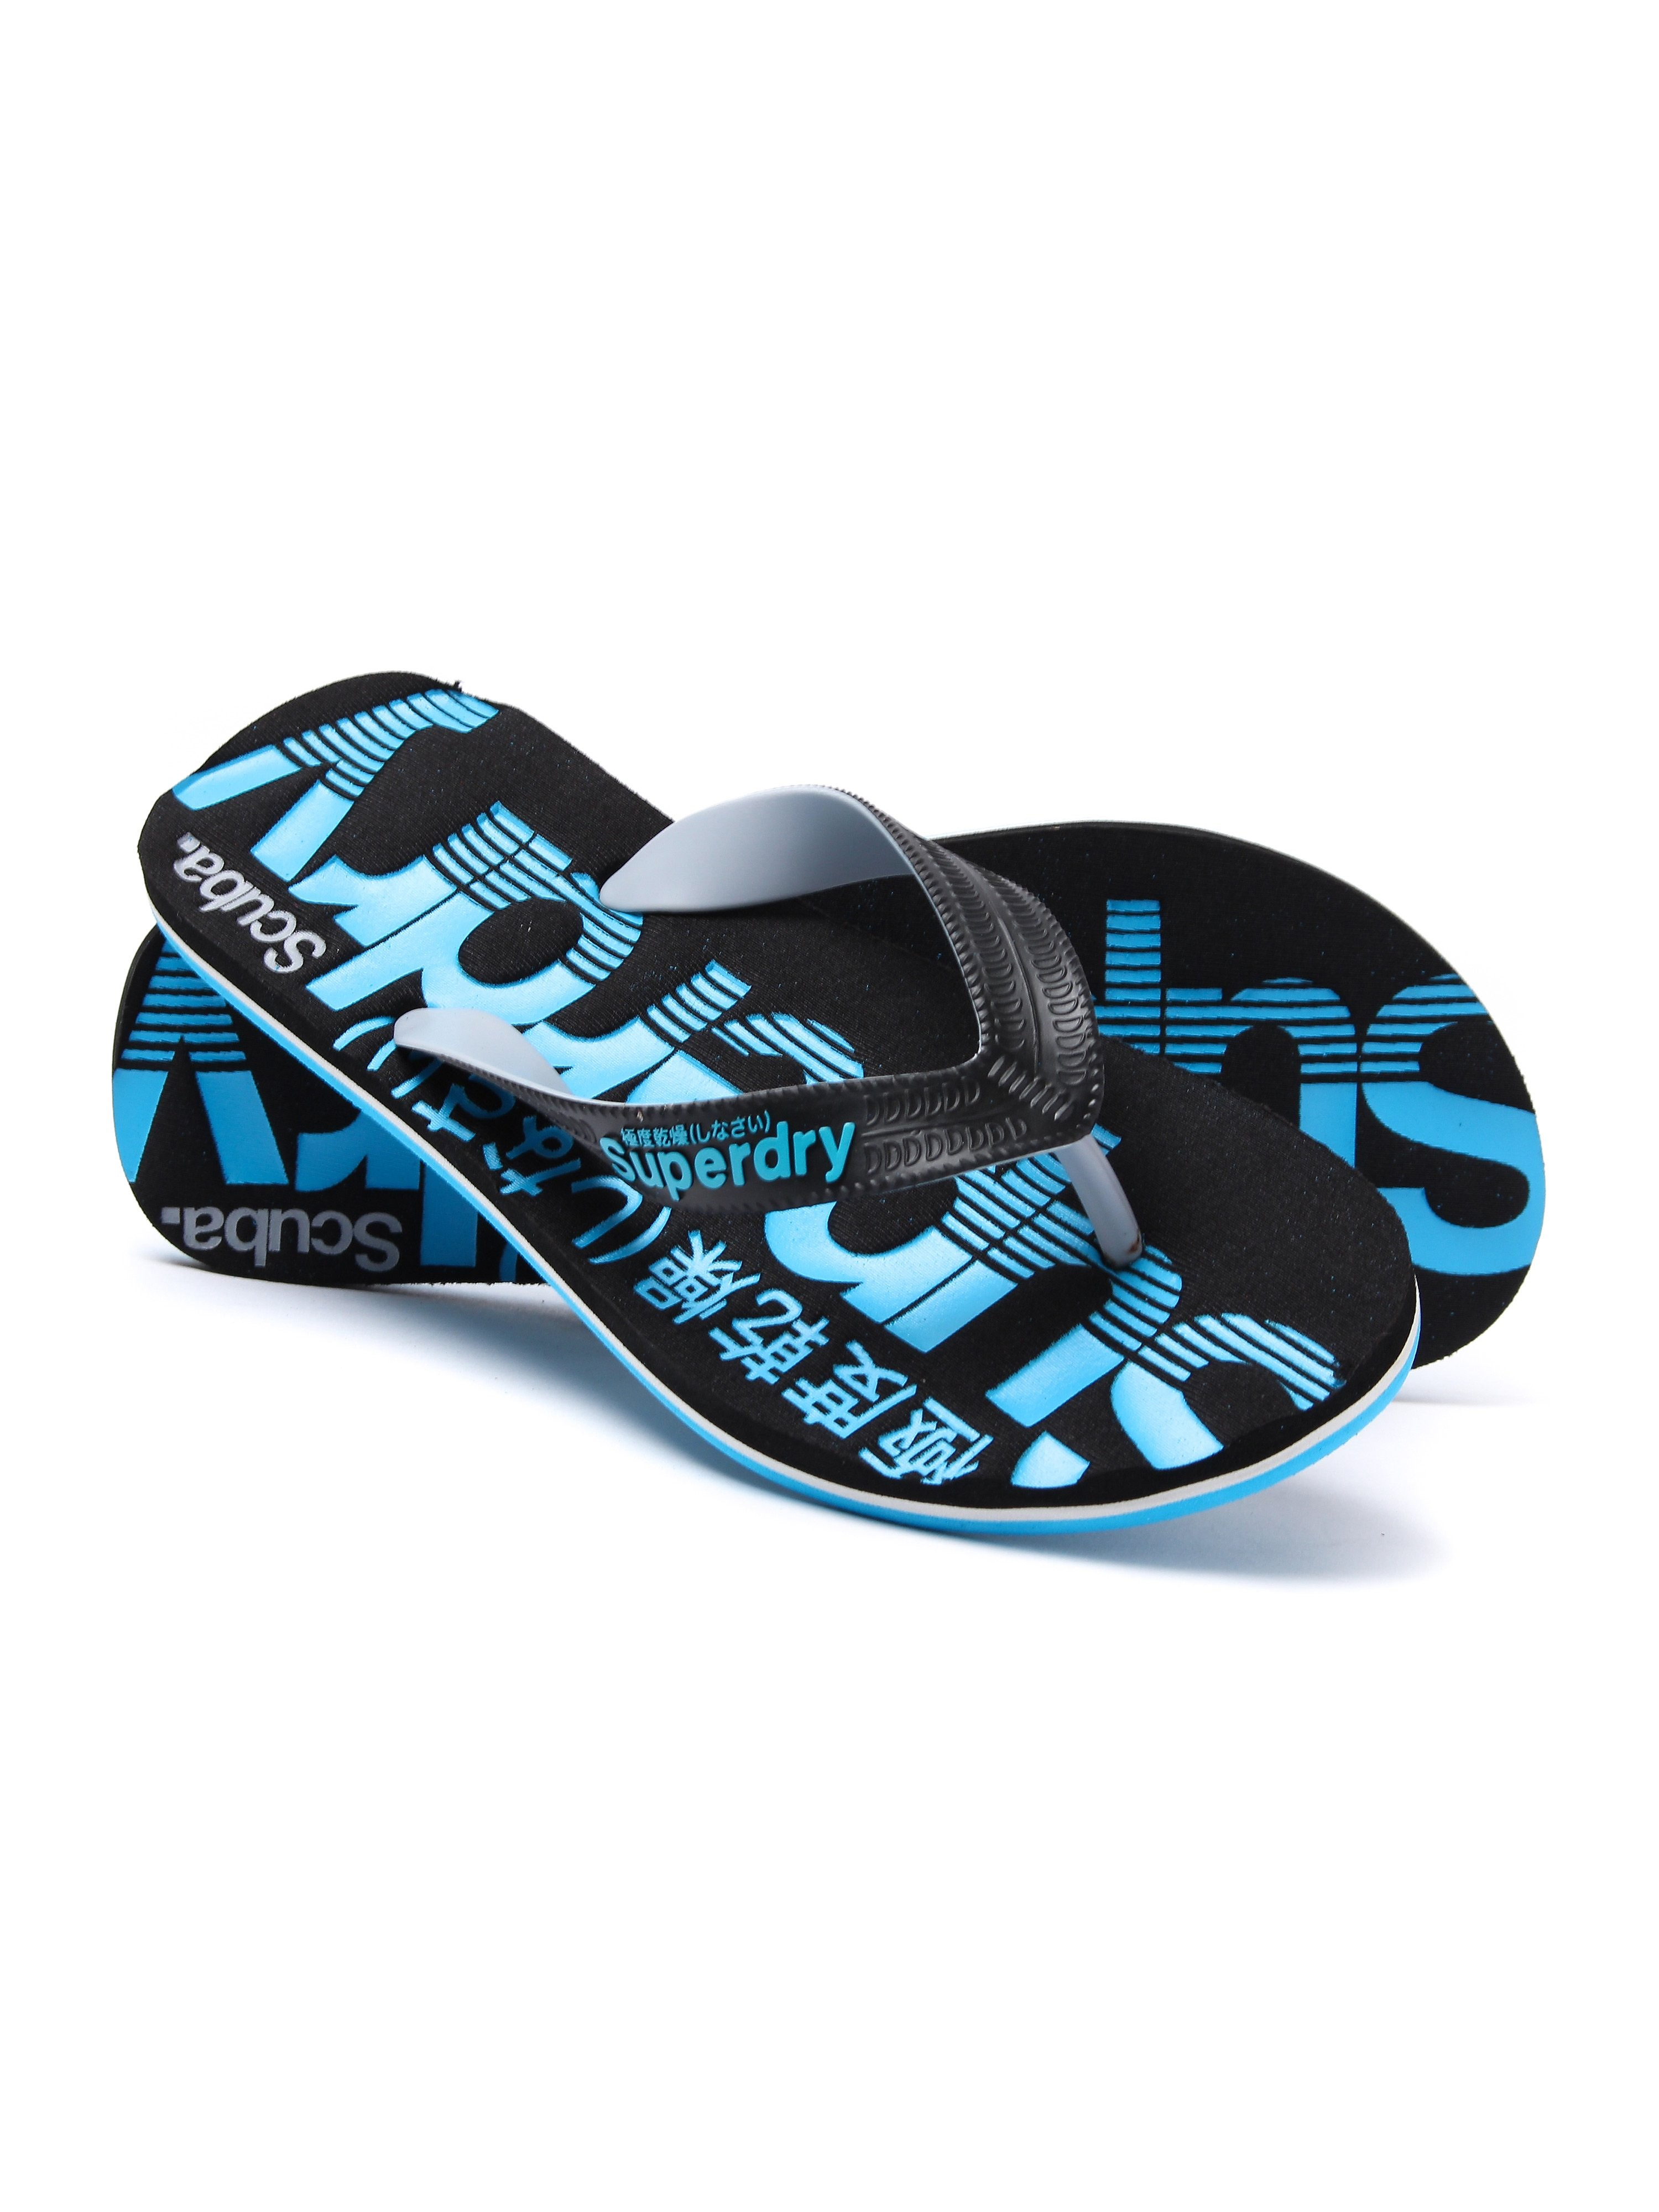 Superdry Men's Scuba Lightweight Flip Flops - Black & Fluro Blue